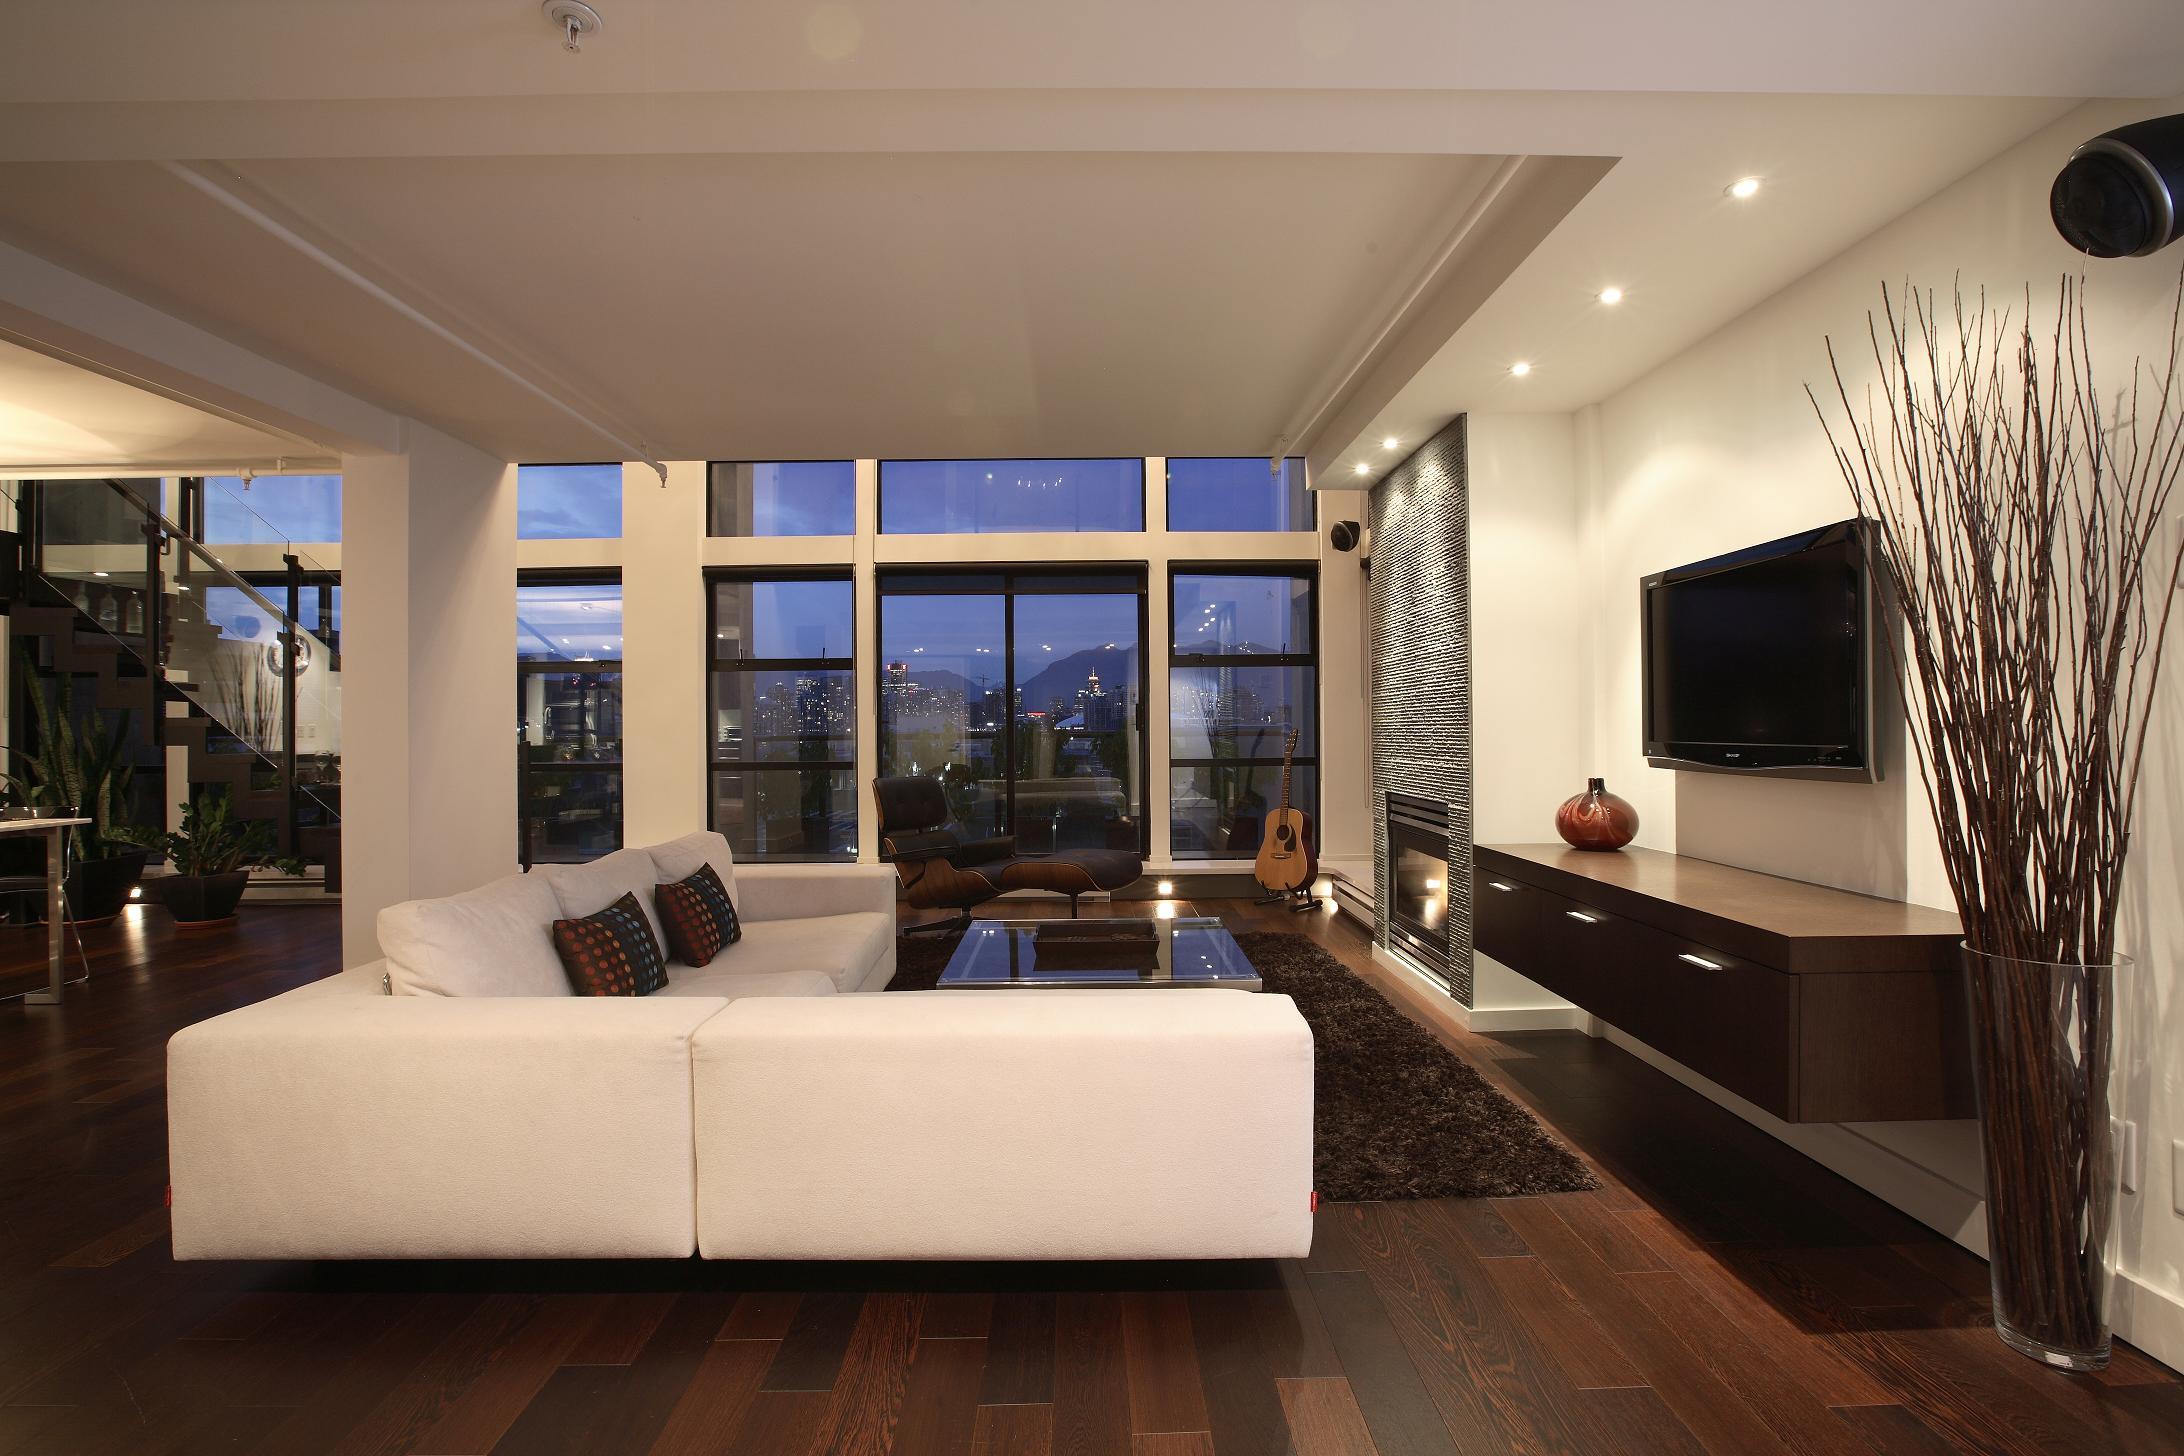 apartment-living-room-design-photos-luxury-design-with-best-home-interior-design-modern-living-room-interior-of-apartment-on-living-room